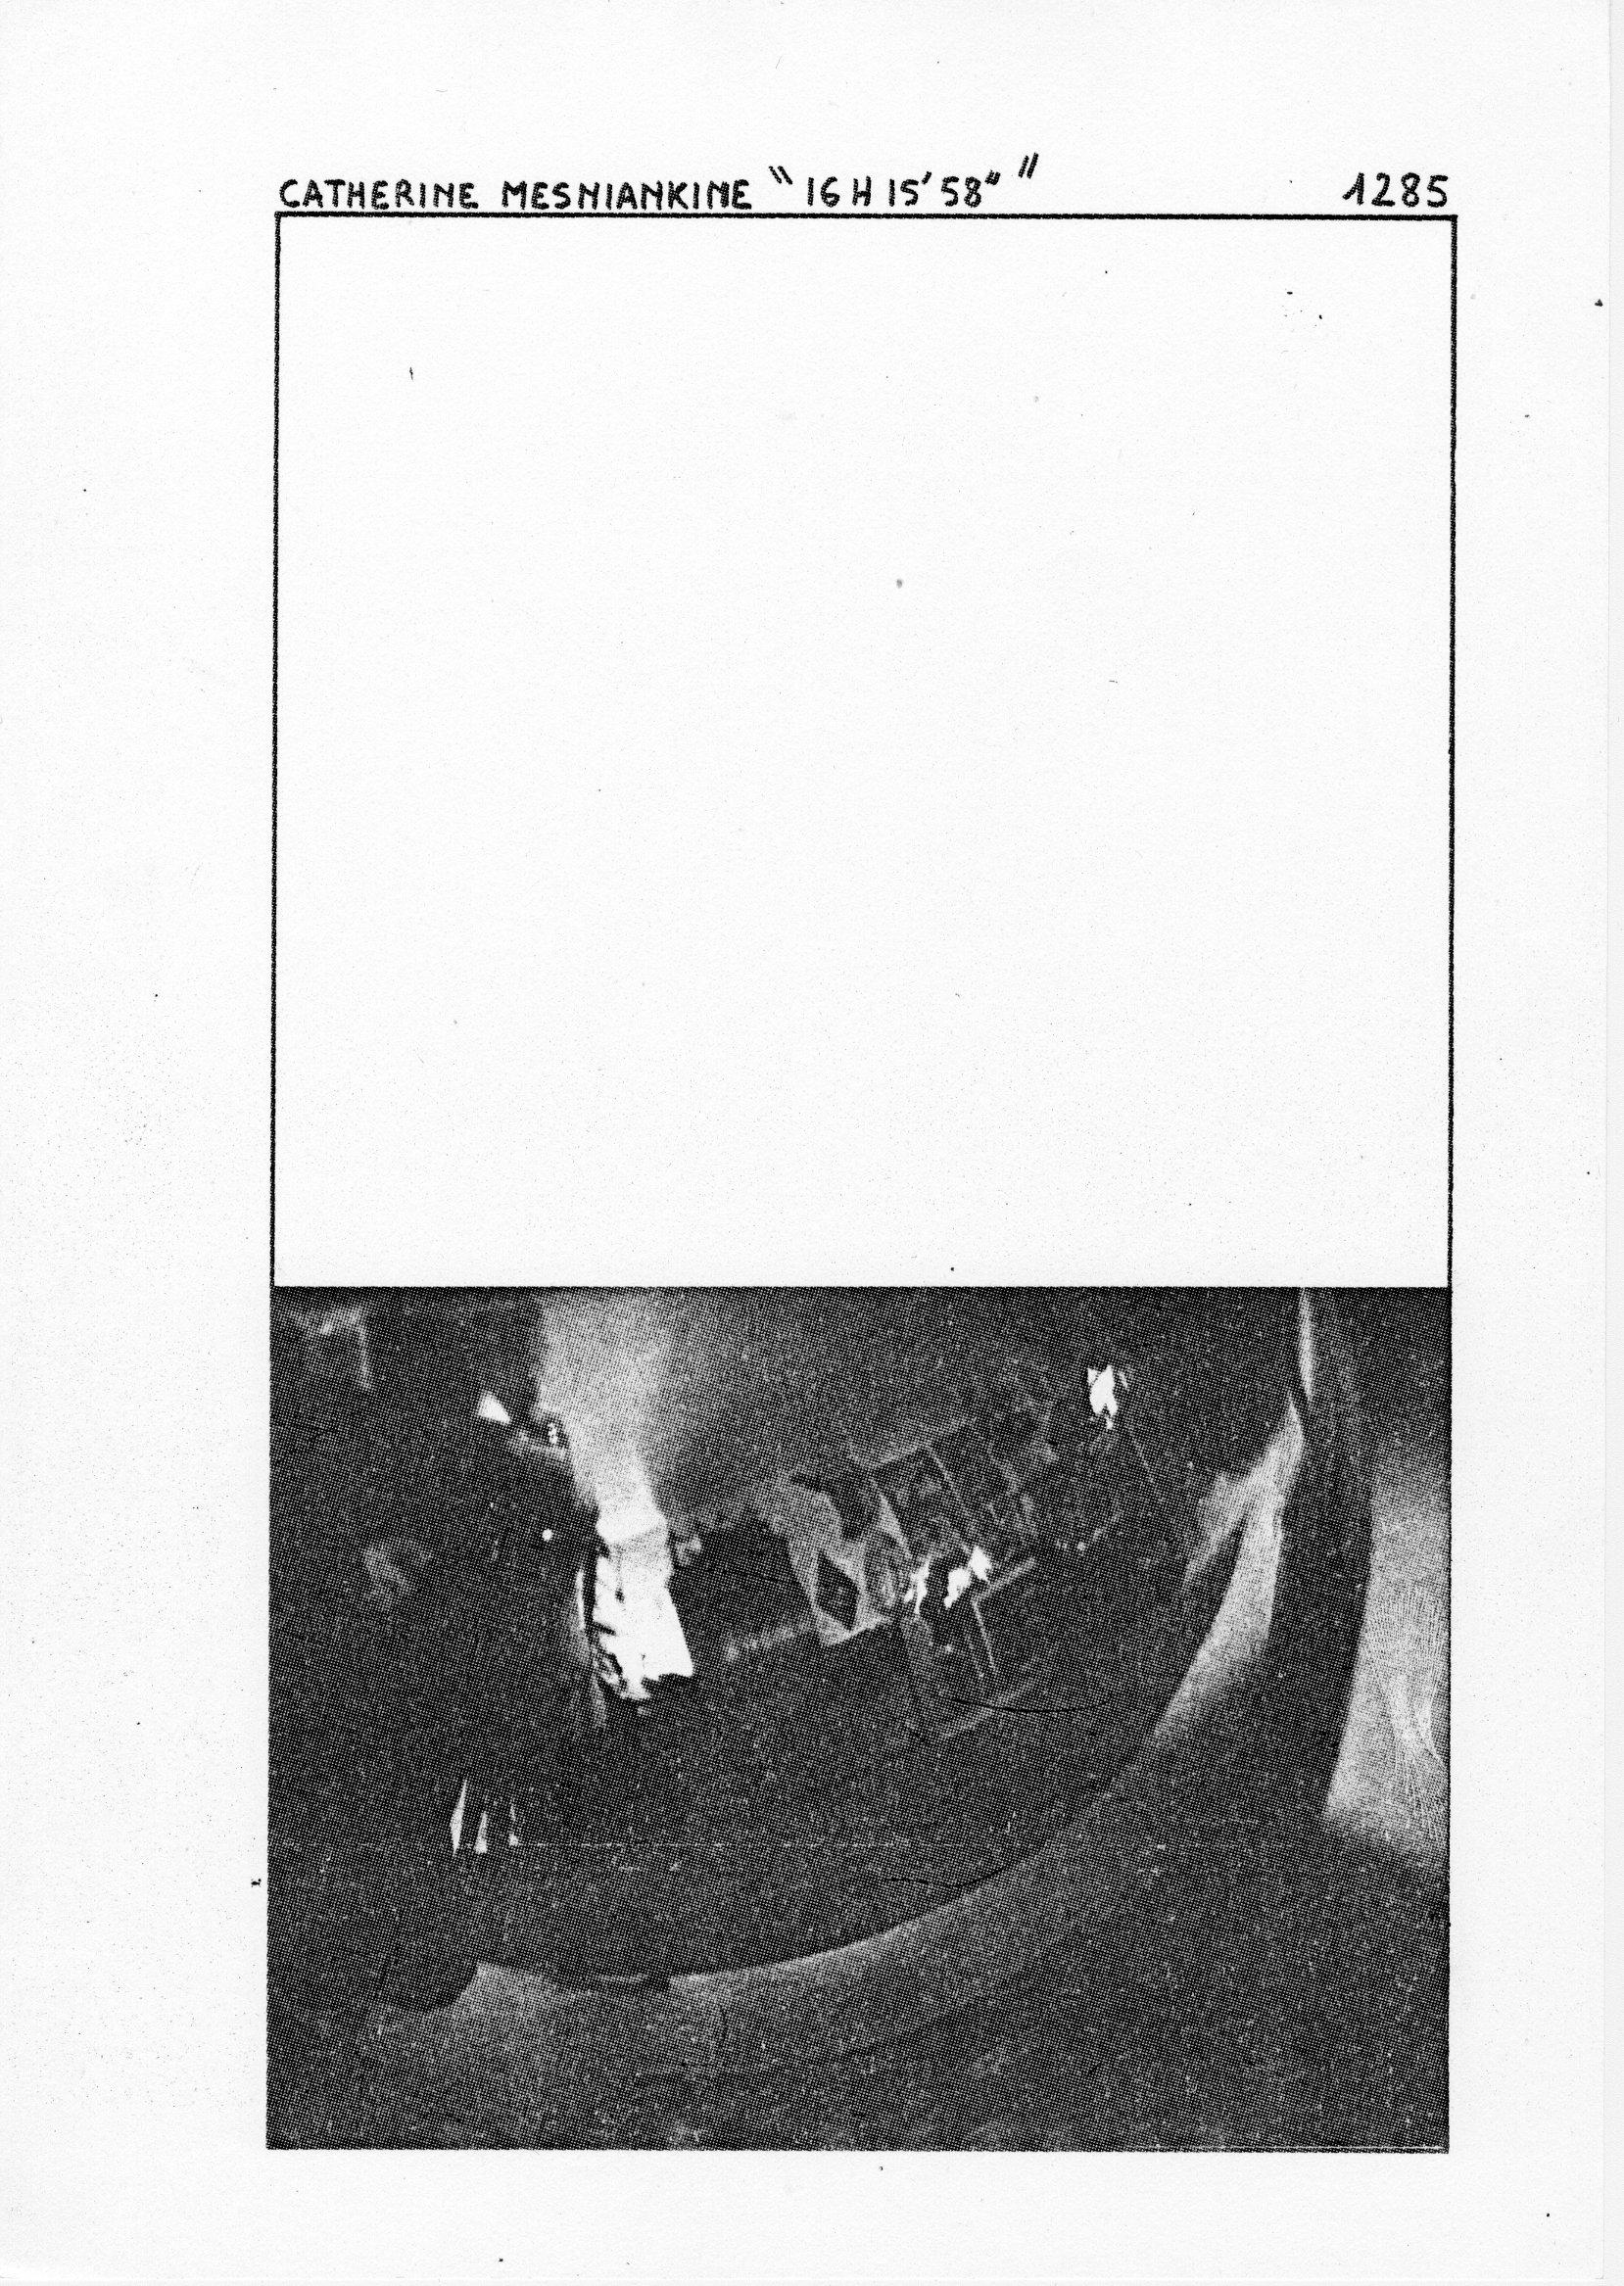 page 1285 C. MESNIANKINE 16 H 15' 58''